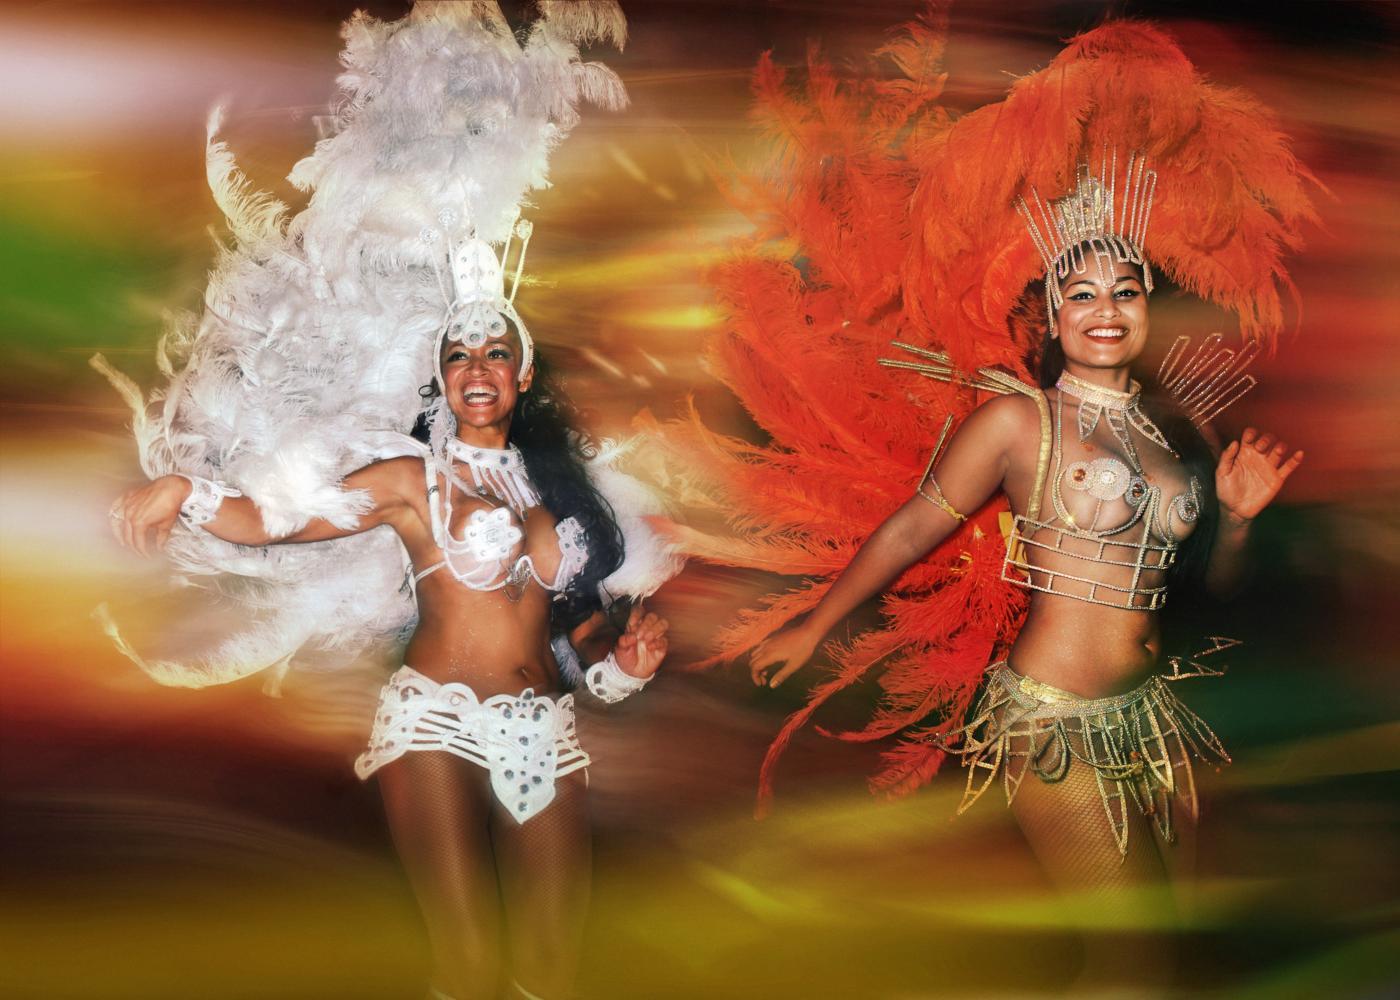 Bailarinas no carnaval de norte a sul